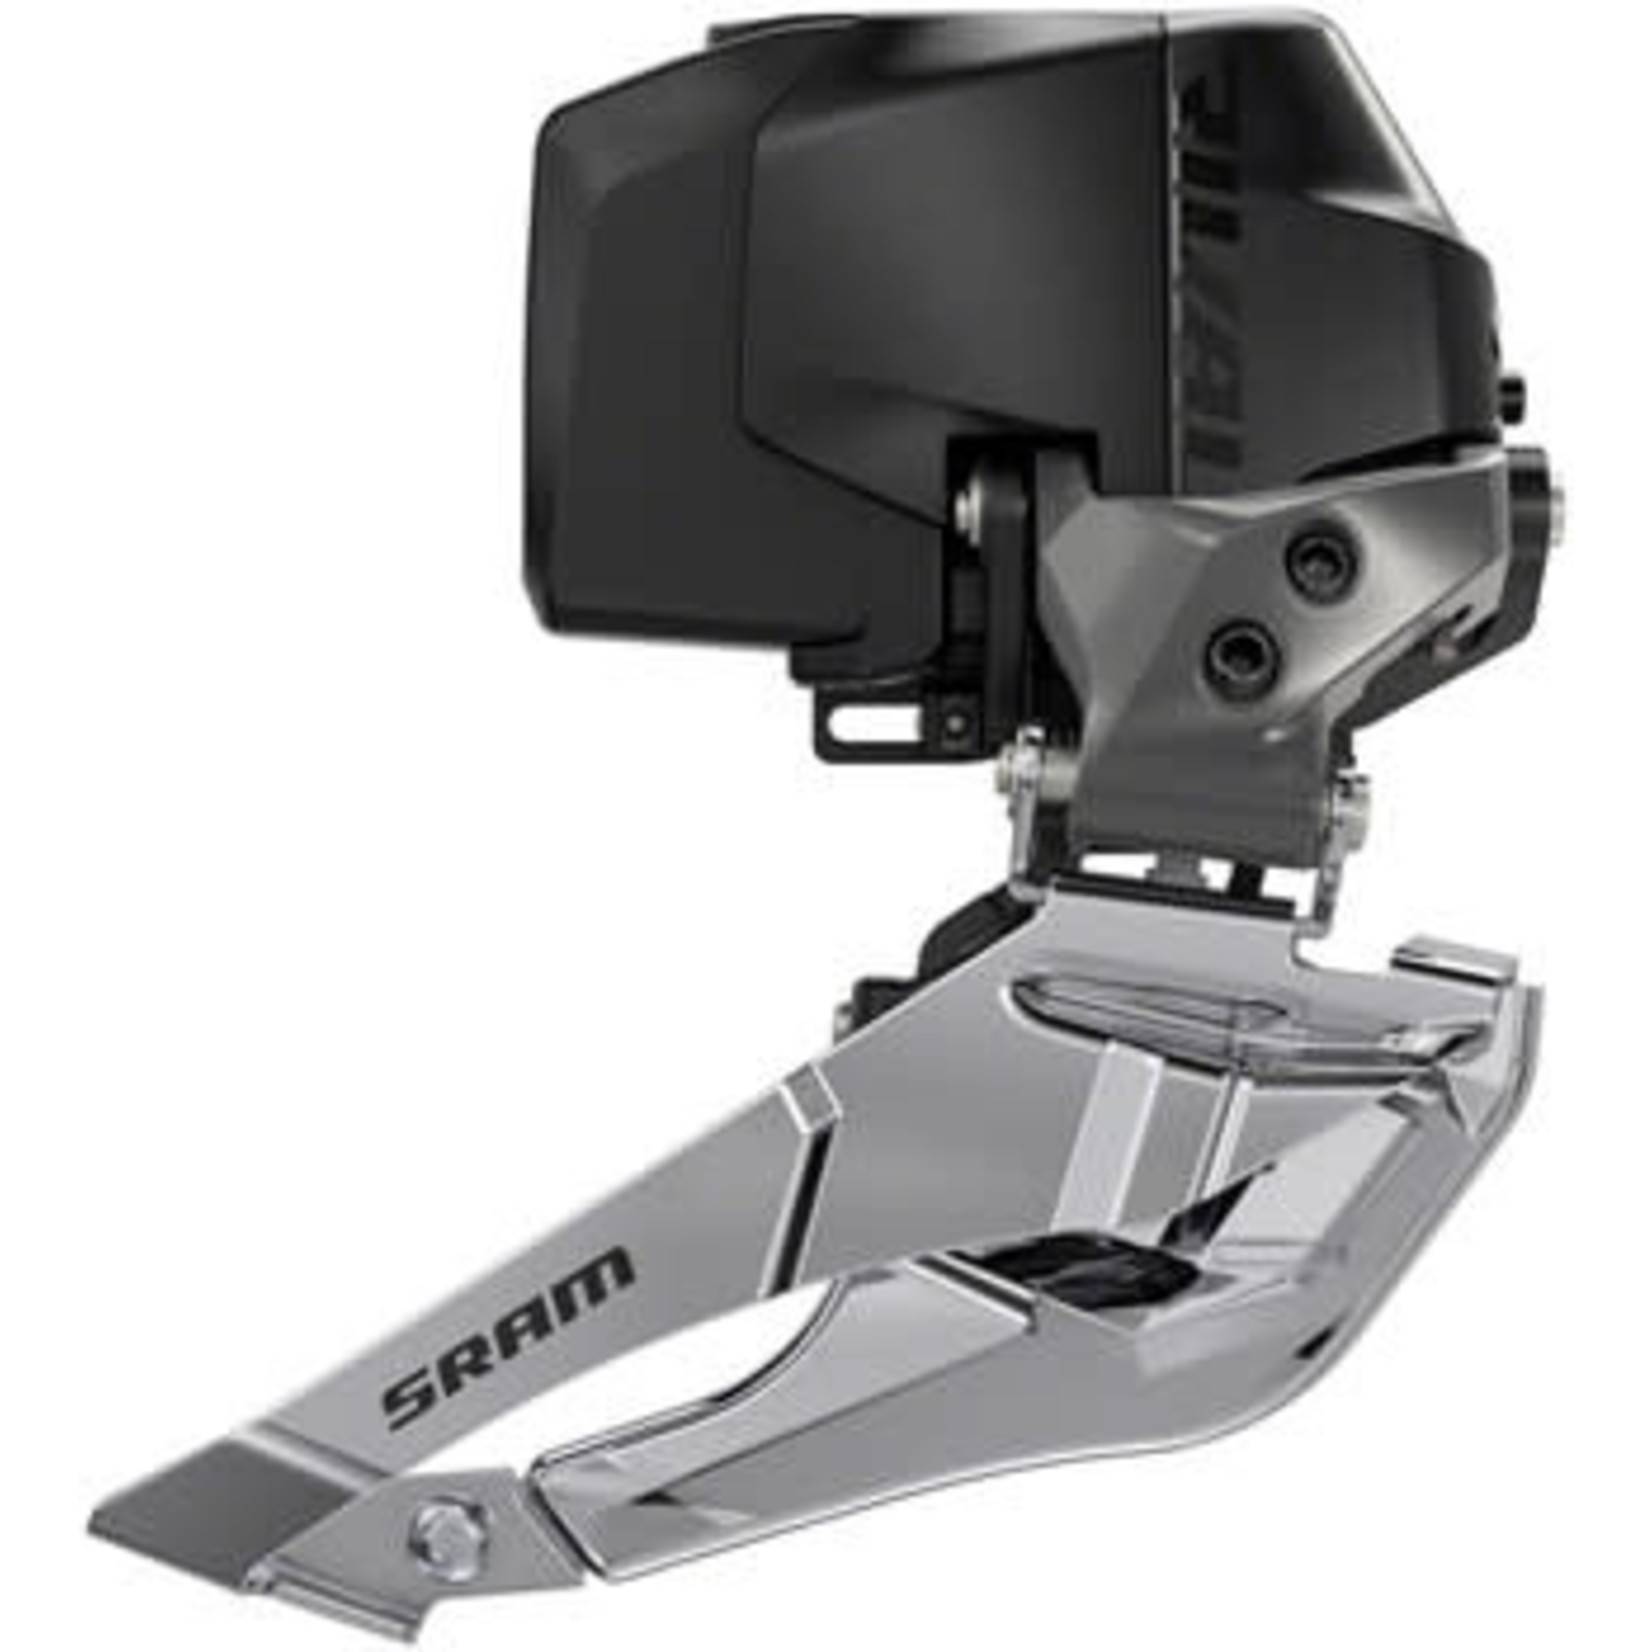 SRAM SRAM Rival eTap AXS D1 Wide Front Derailleur 12 Braze-on